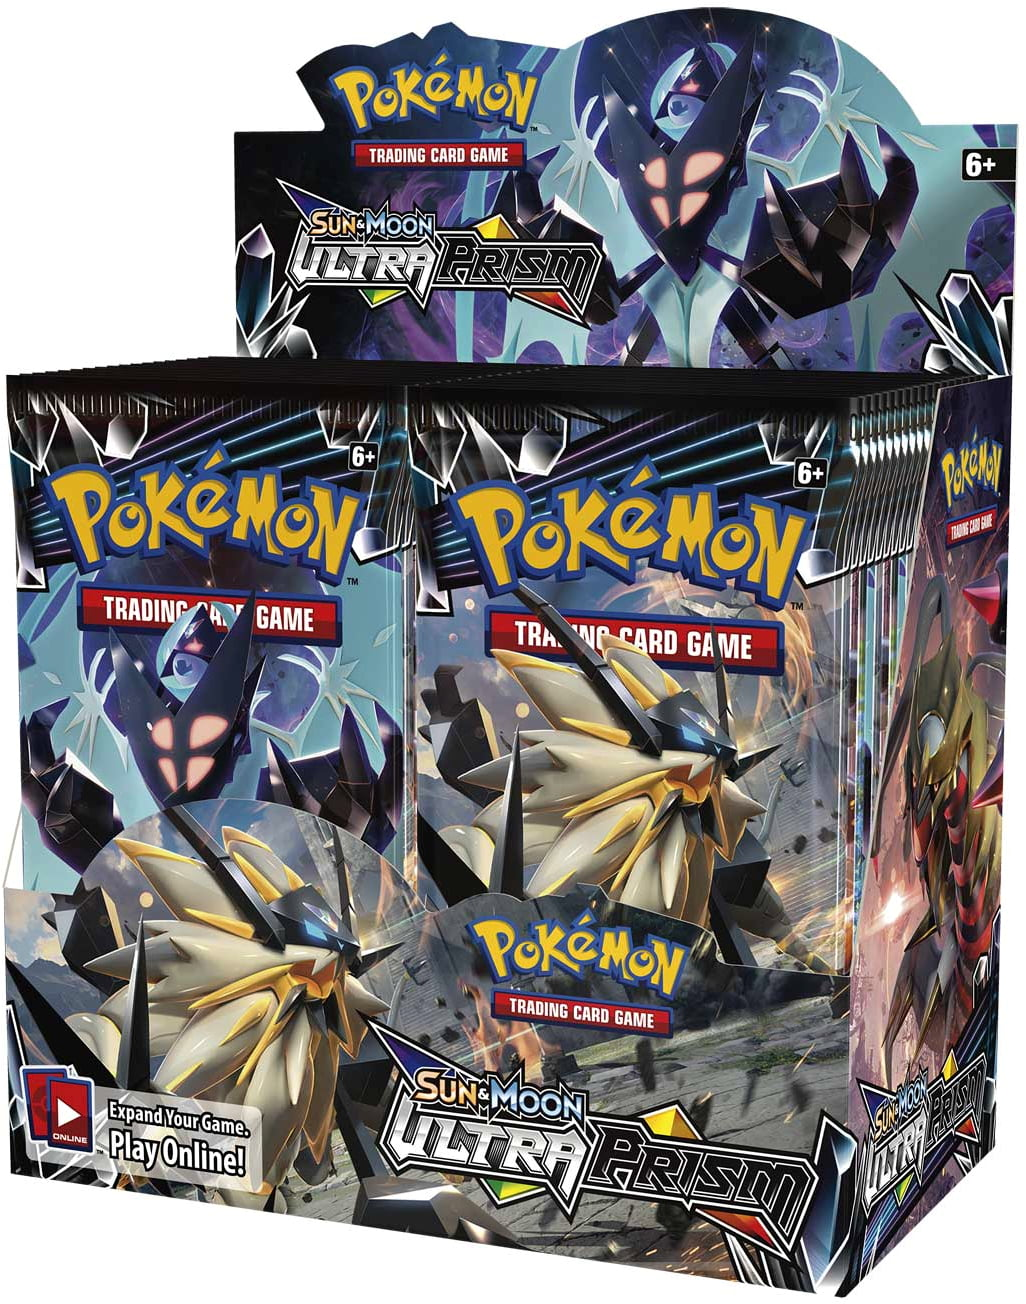 Pokemon TCG Sun & Moon Ultra Prism Booster Box by Nintendo